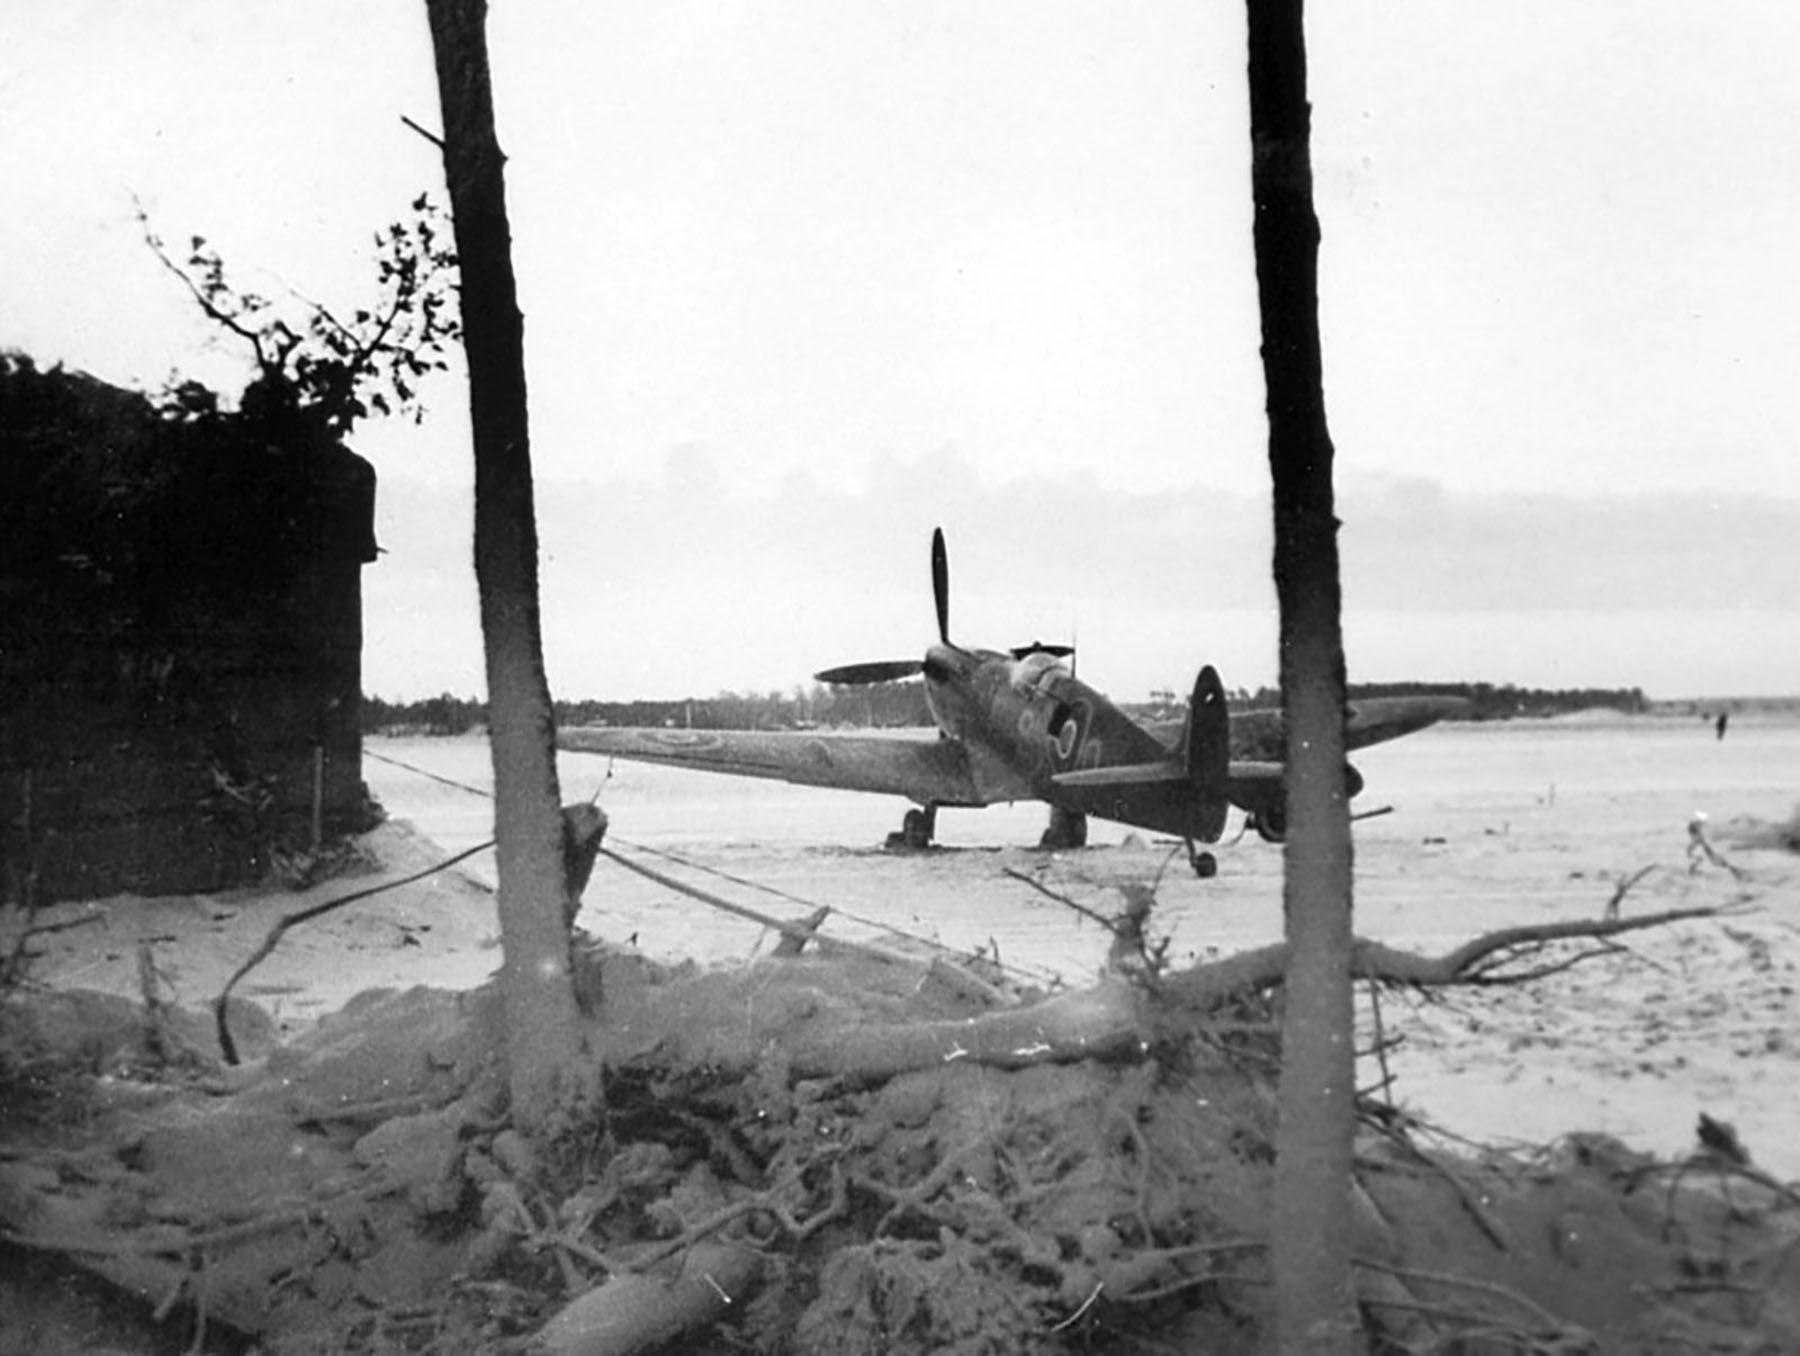 Spitfire RAF 132 Wing at Woensdrecht Holland 1945 NIMH 01